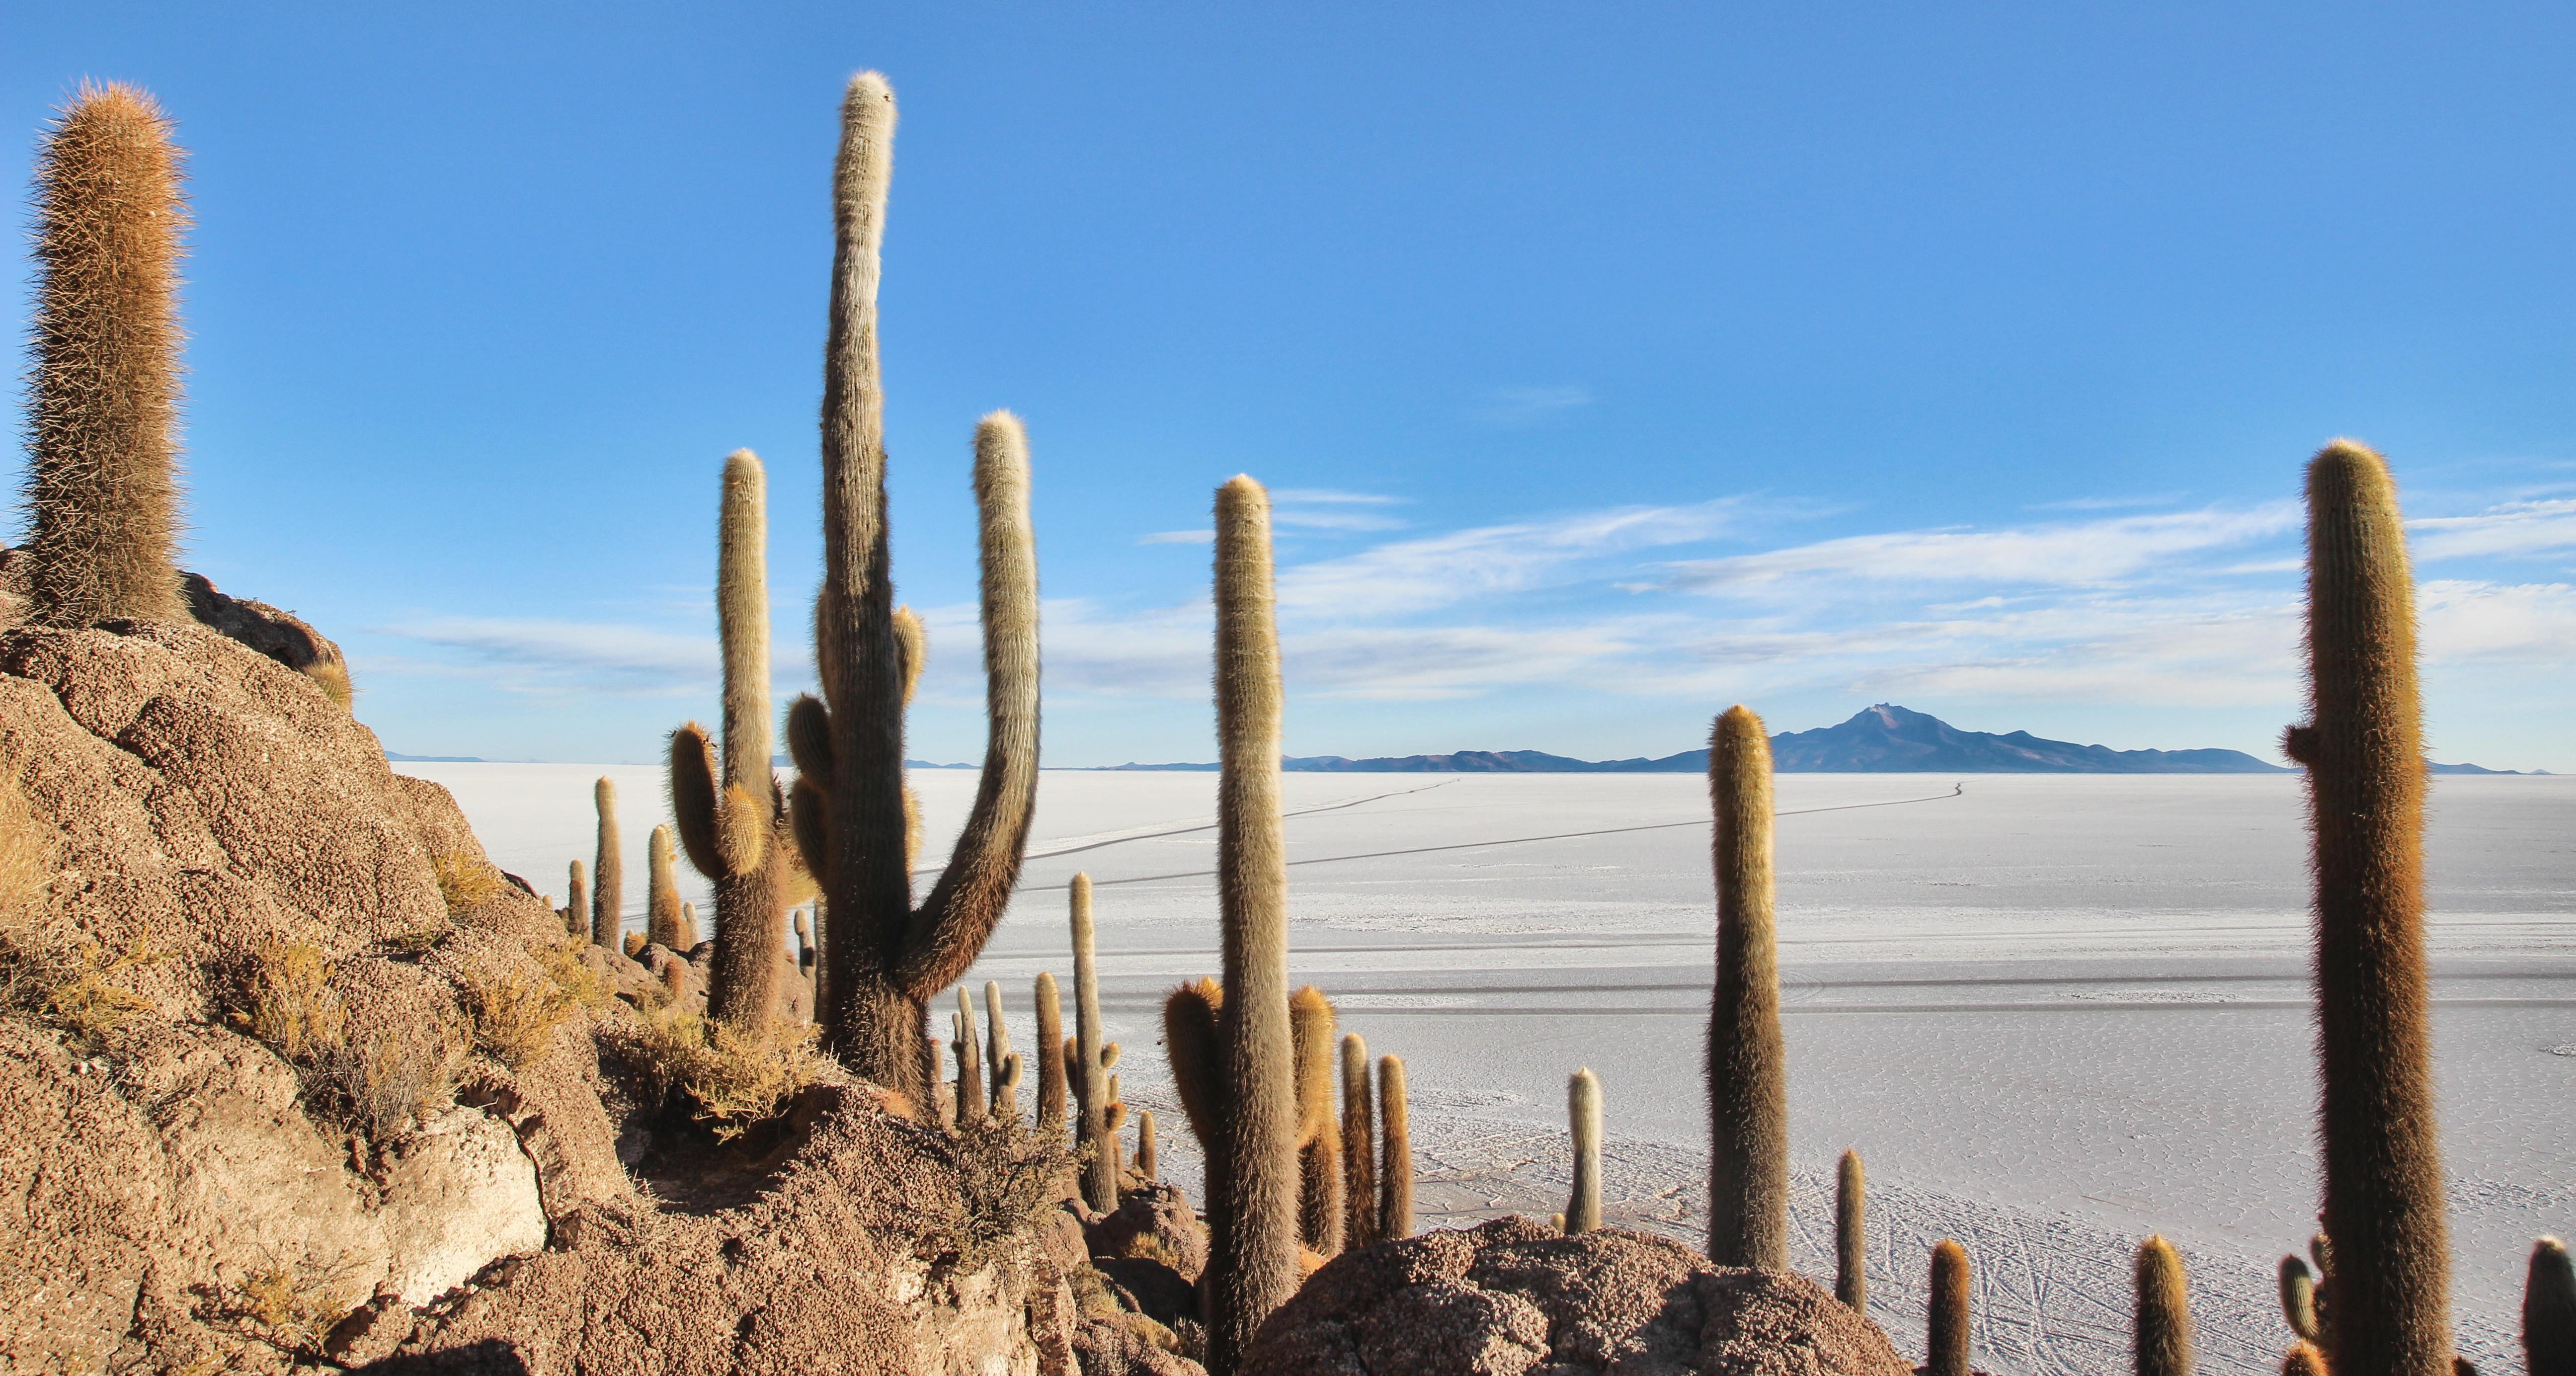 Salar de Uyuni in Bolivia is on many people's bucket list